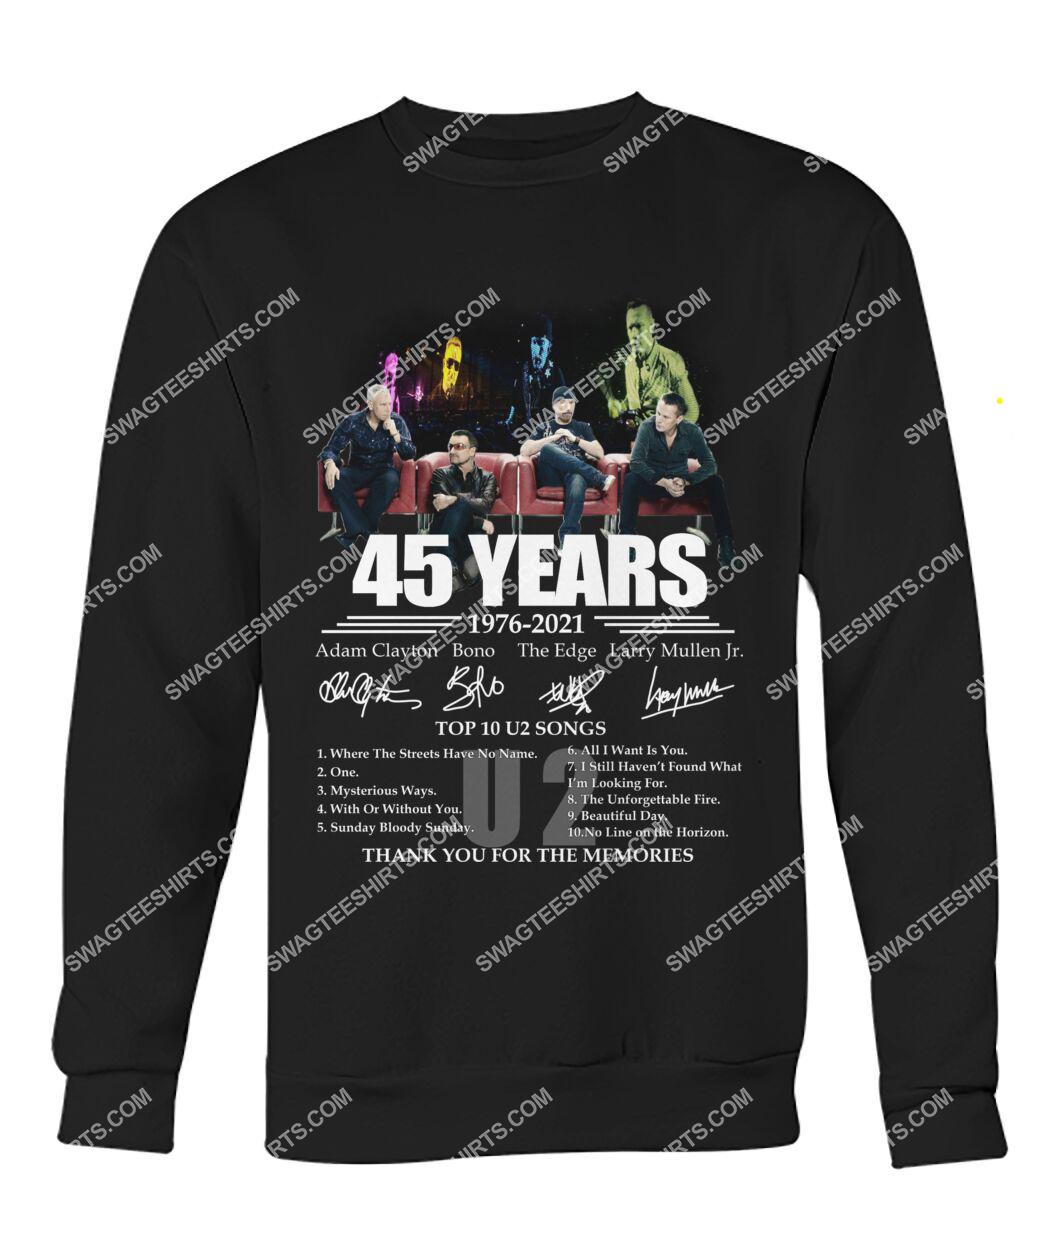 u2 band 45 years thank you for memories signatures sweatshirt 1